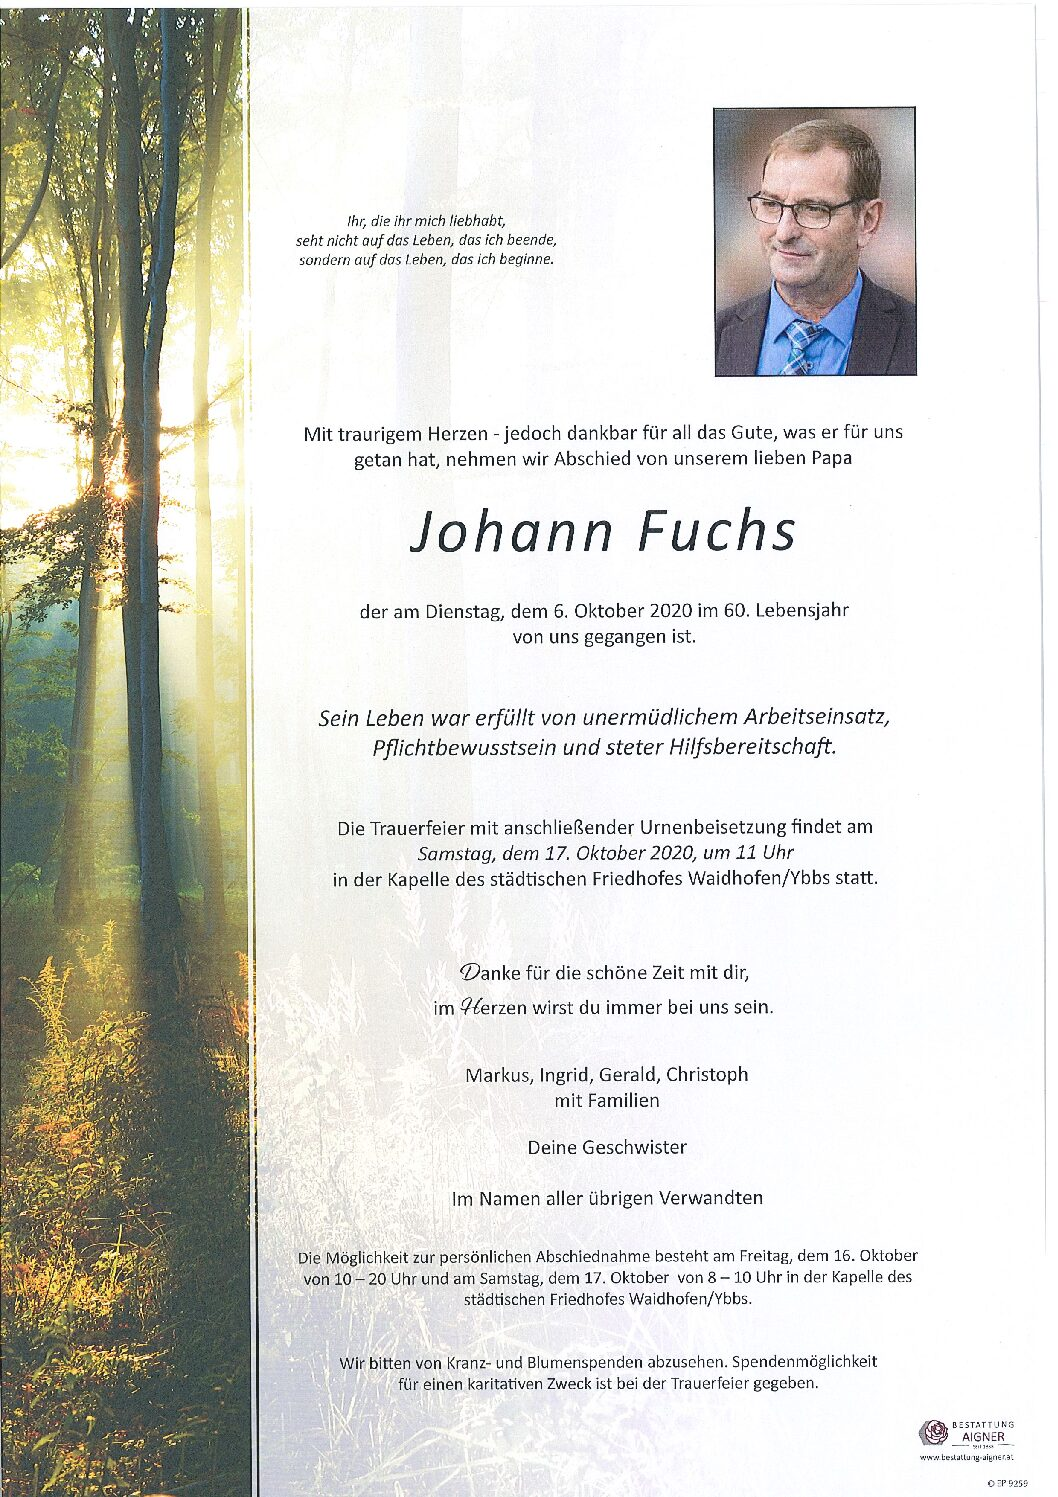 Johann Fuchs